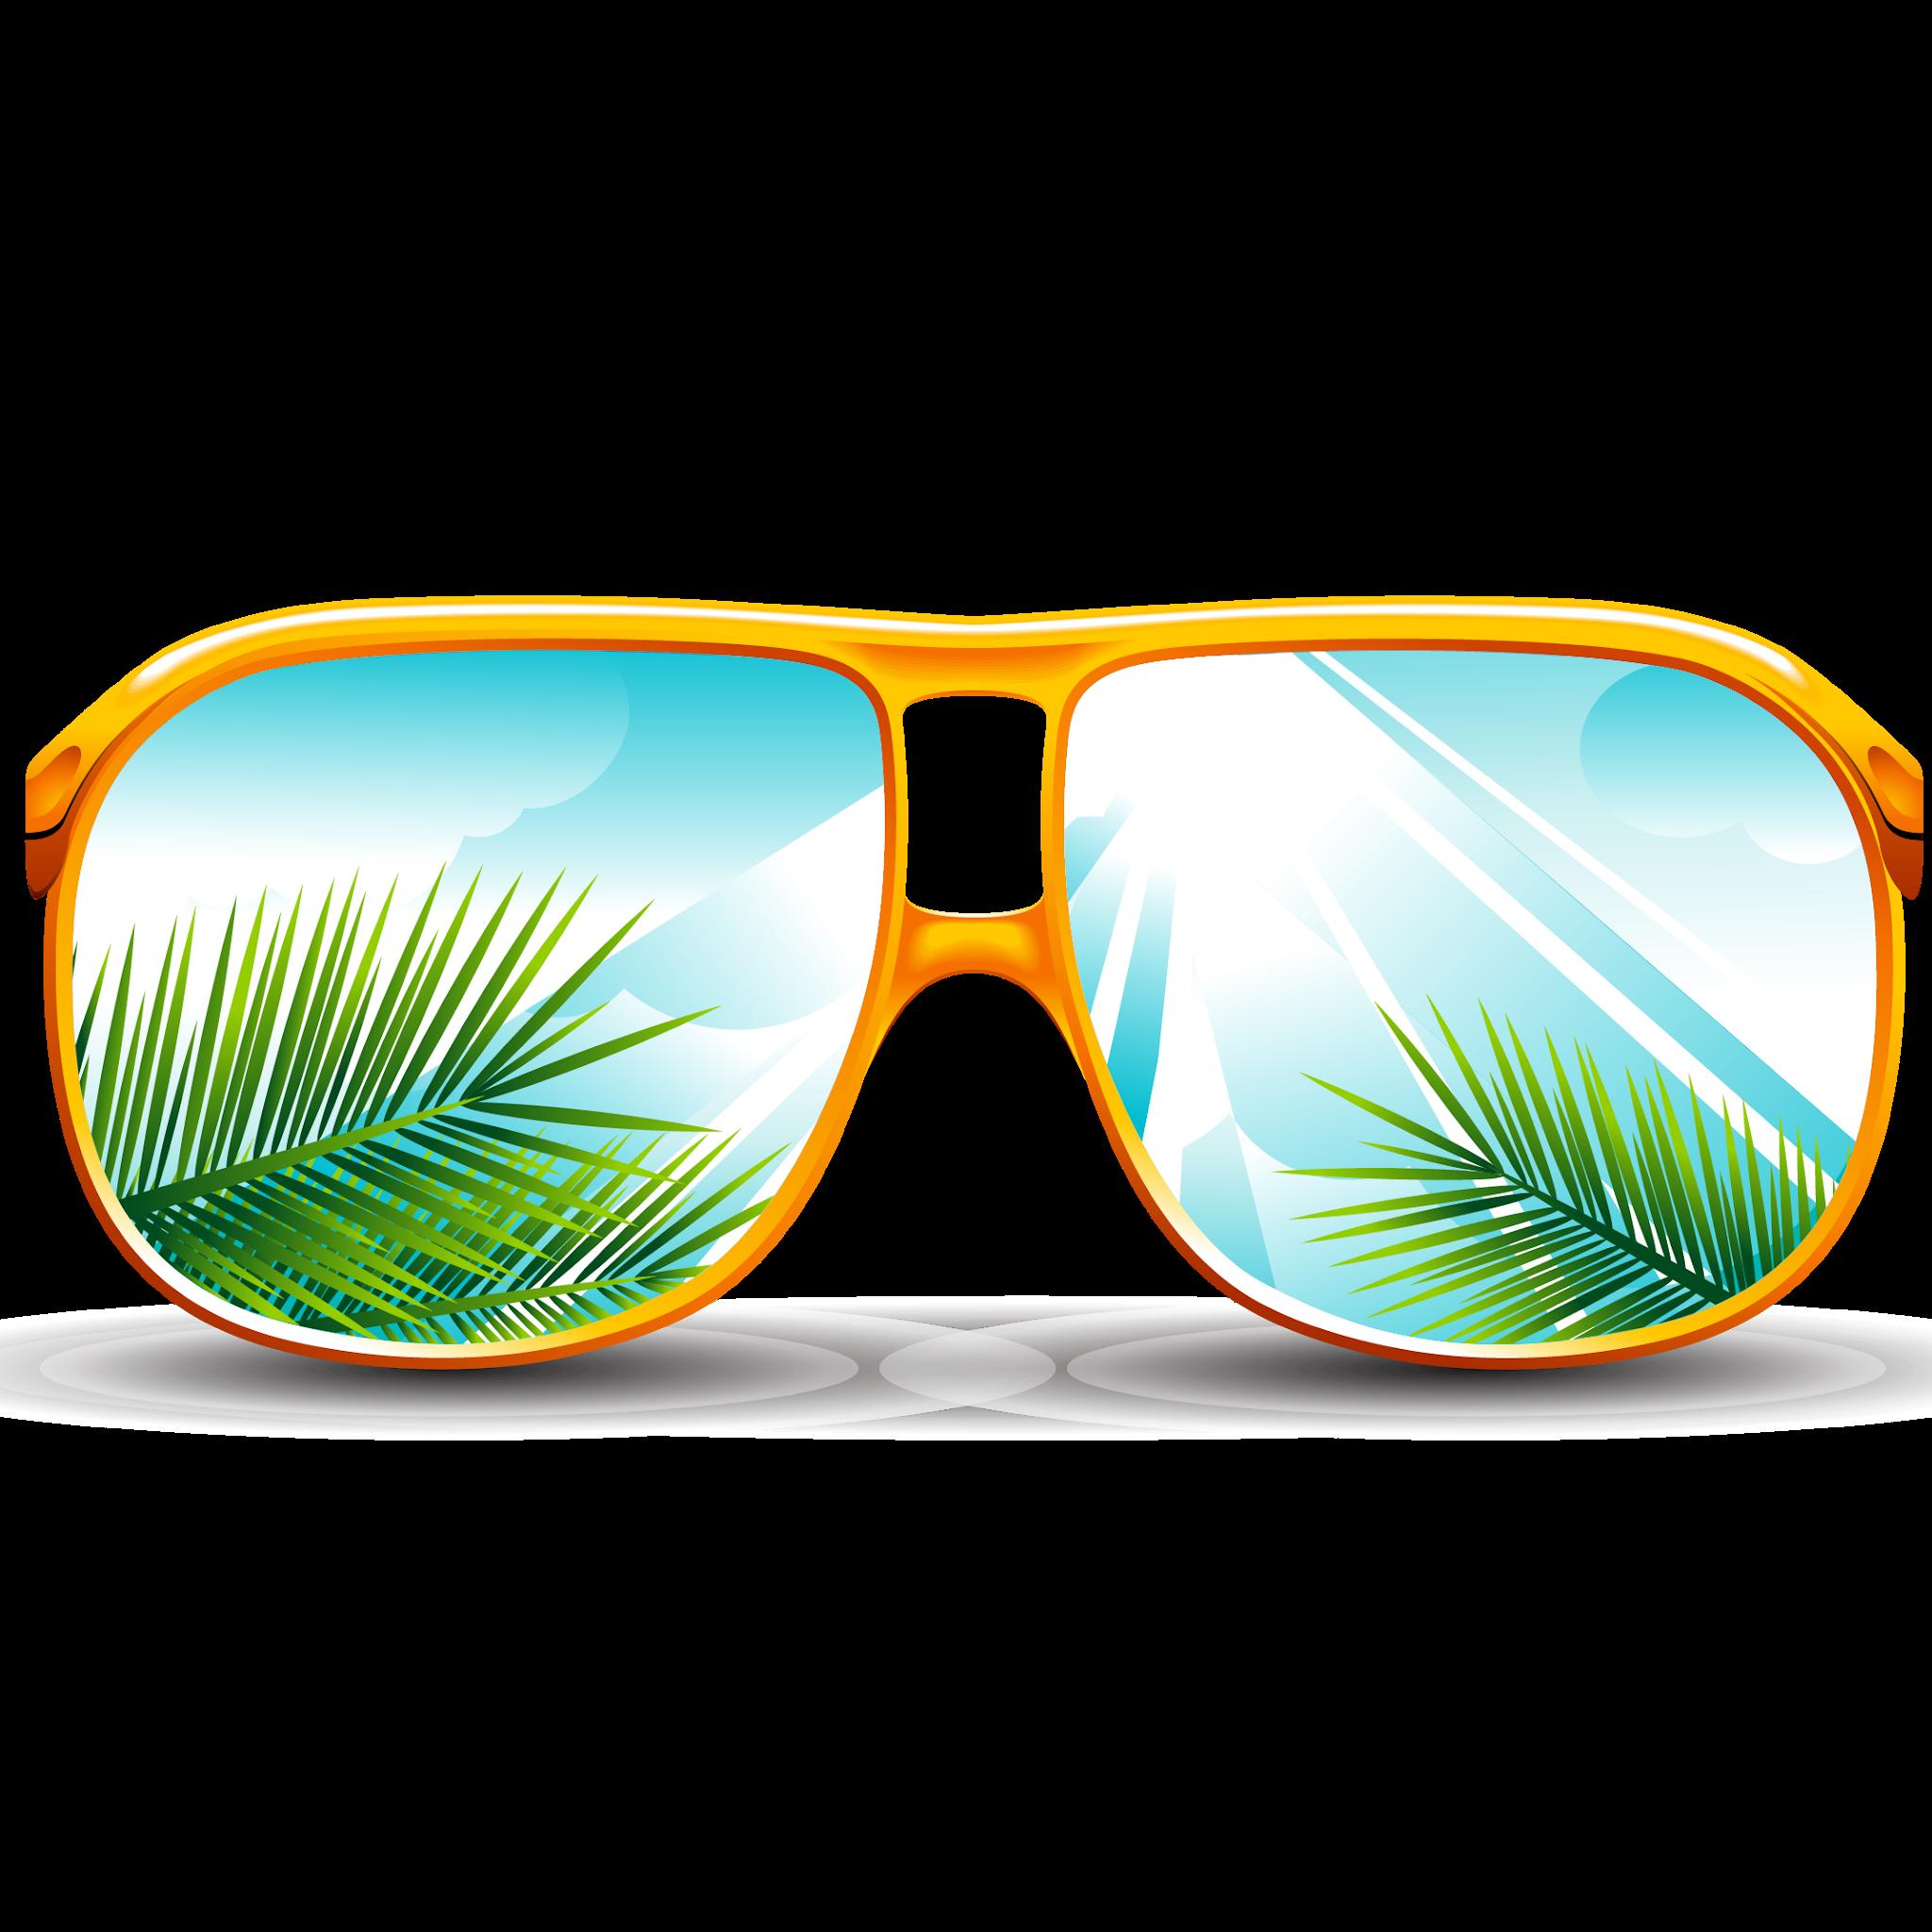 Blue Sunglasses Png Glasses Png Image Blue Sunglasses Sunglasses Glasses